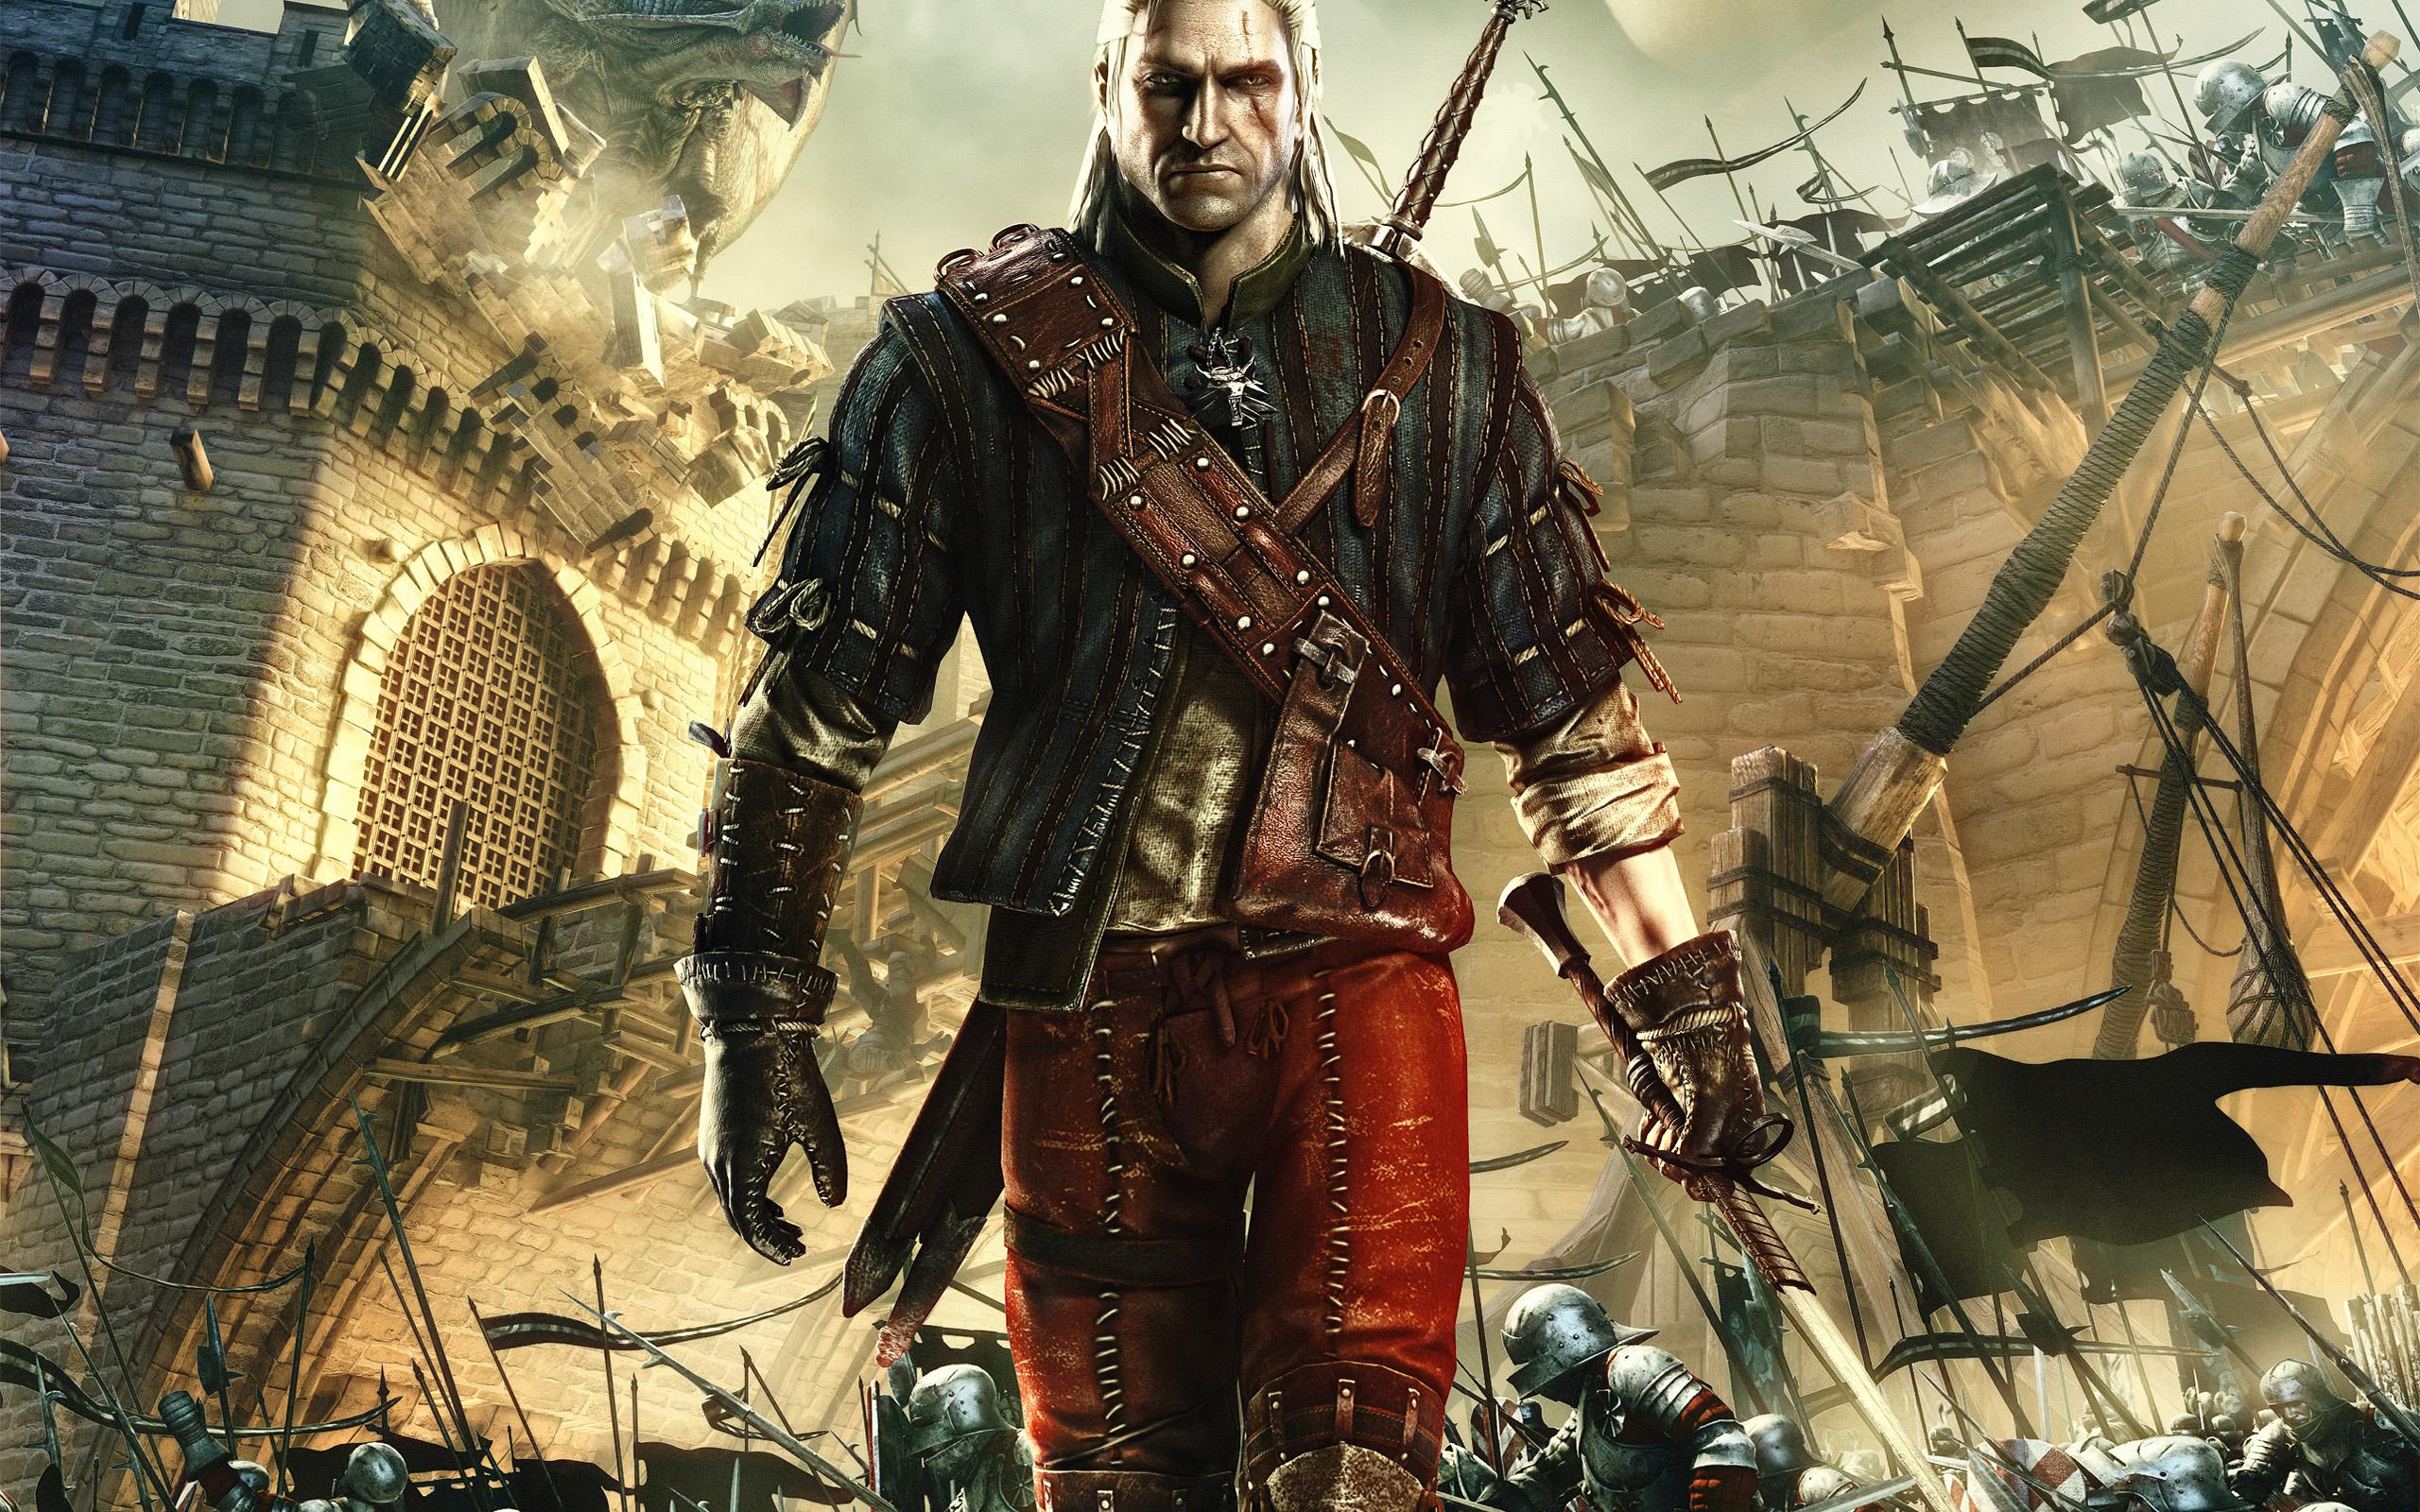 The Witcher 2: Assassins Of Kings Computer Wallpapers, Desktop